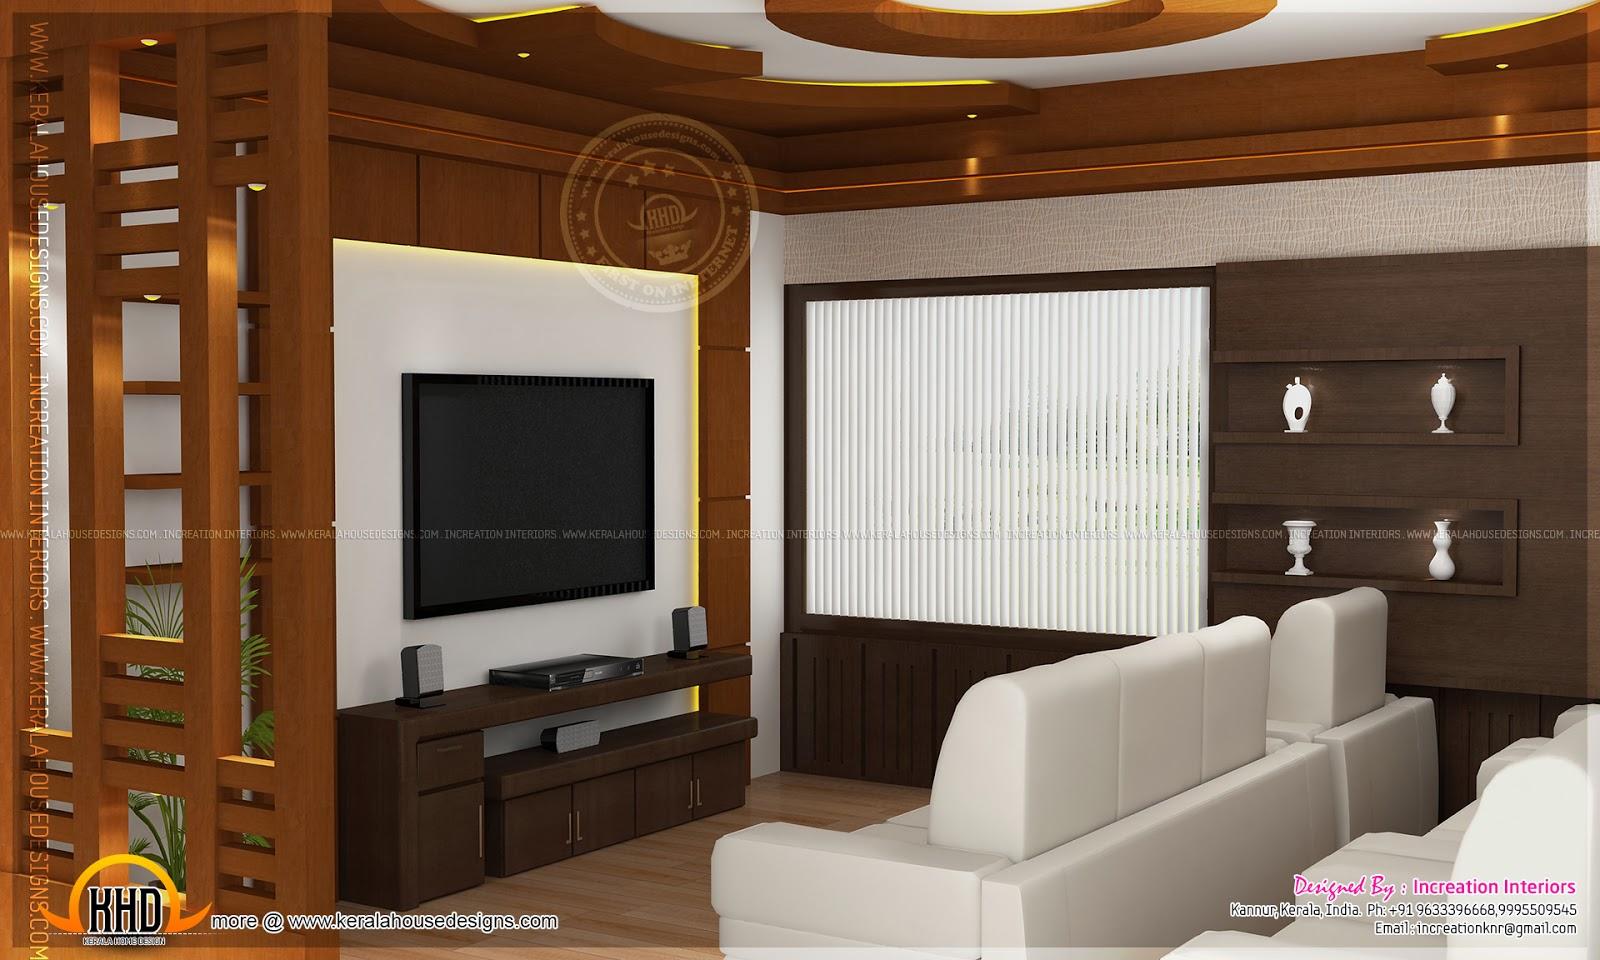 Kerala Home Interior Wall Design Flisol Home